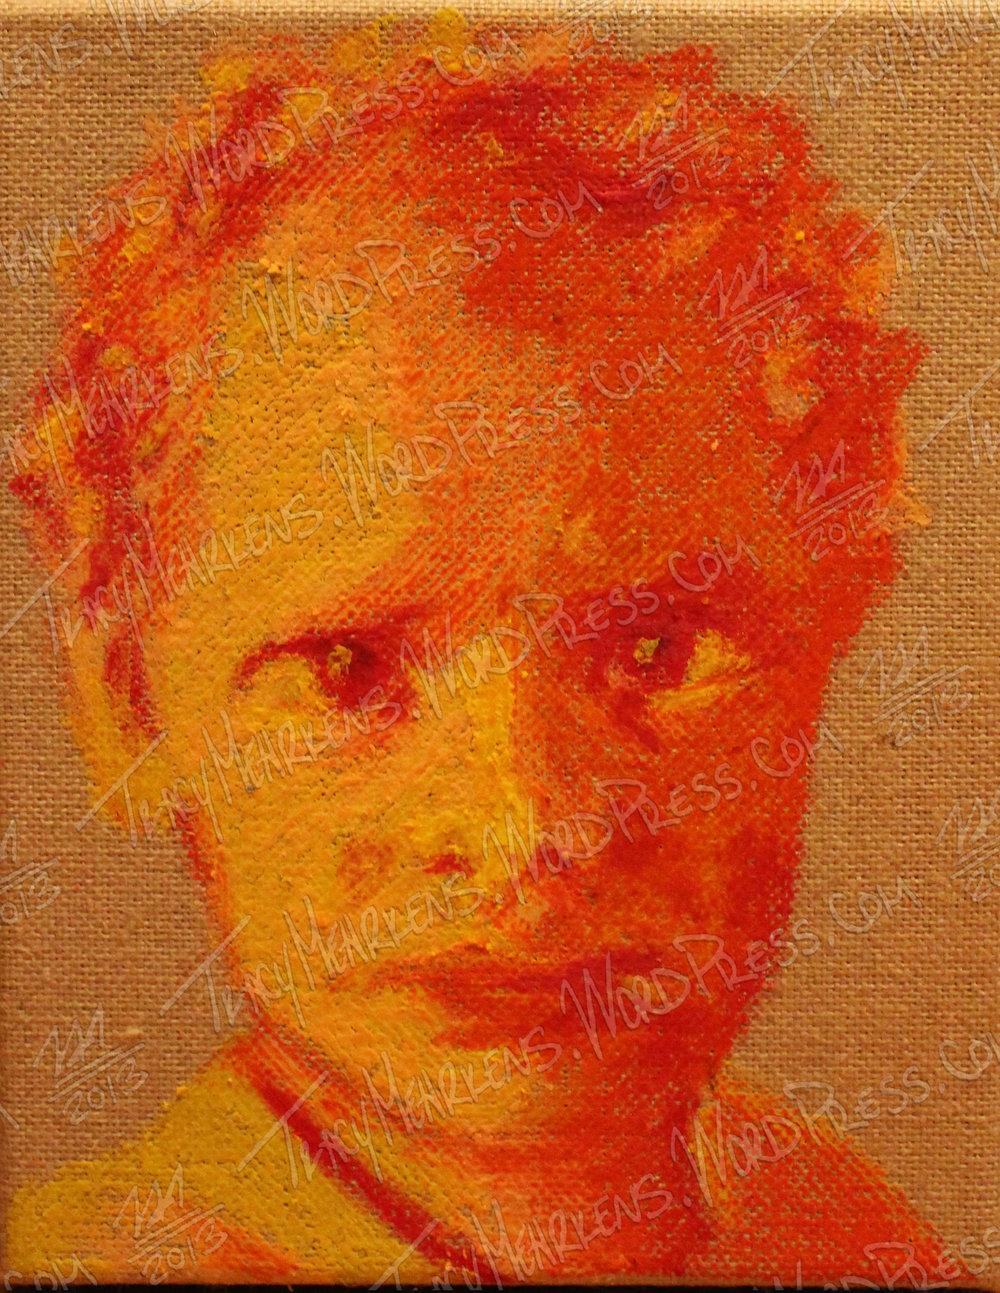 Crayon on Burlap Canvas. 8x10 in. 2014.